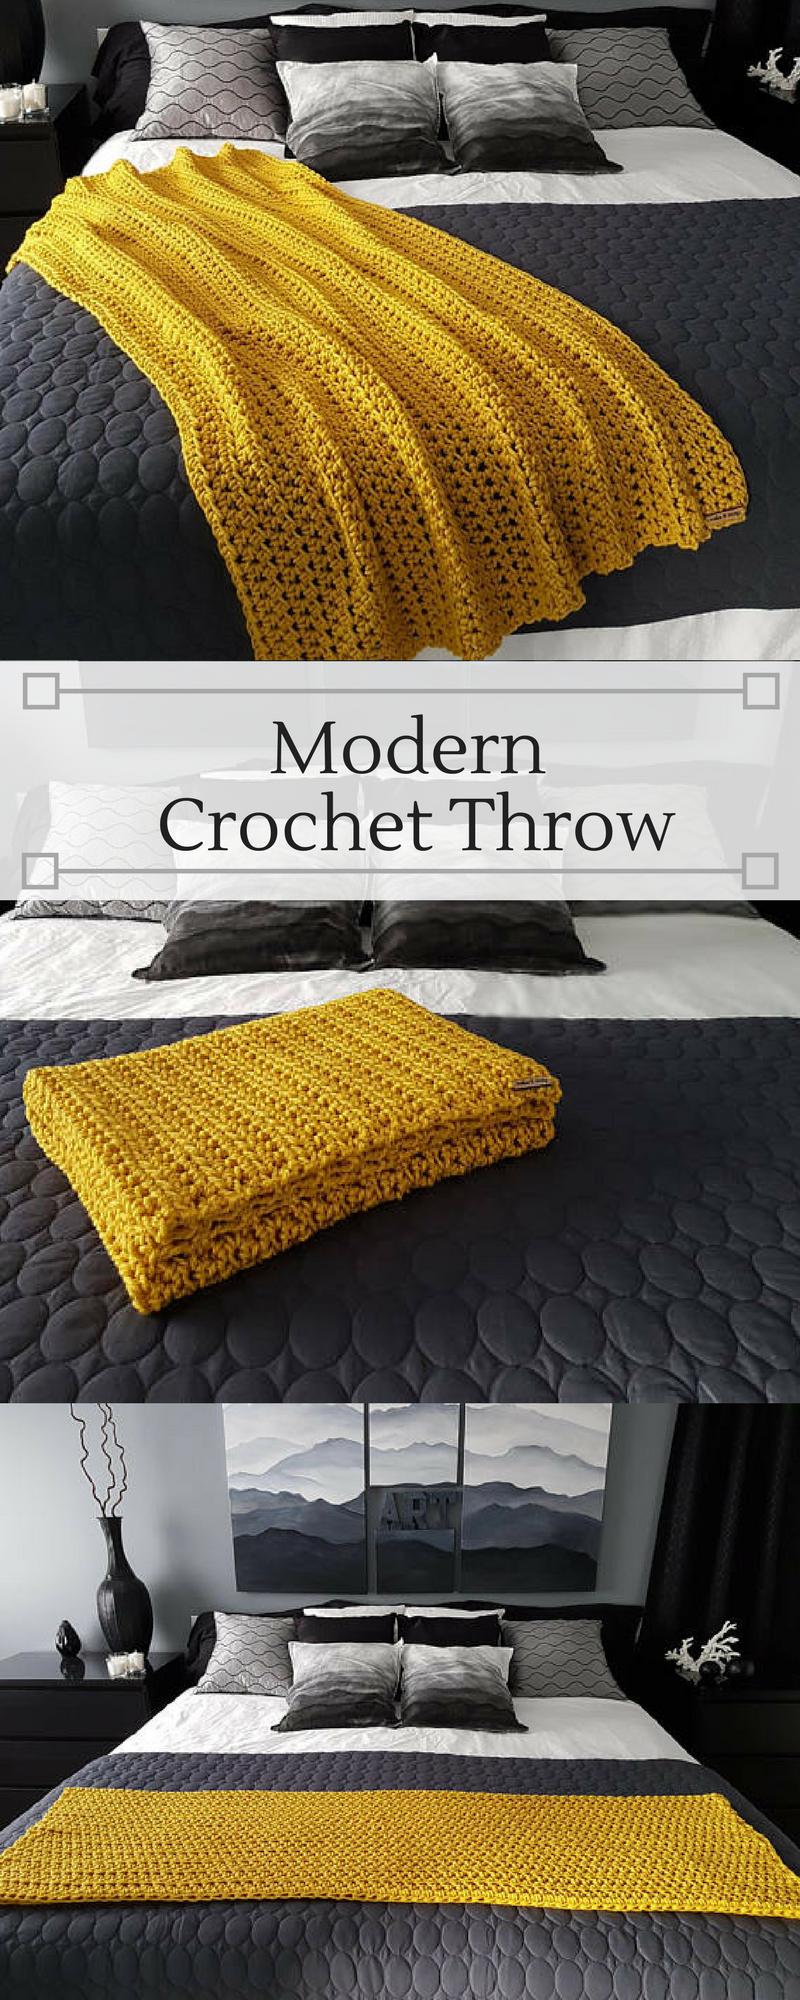 Mustard Yellow Crochet Blanket Afghan Chunky Crochet Throw Blanket Modern Chunky Throw Ye Chunky Crochet Throw Blanket Chunky Crochet Throw Yellow Blankets